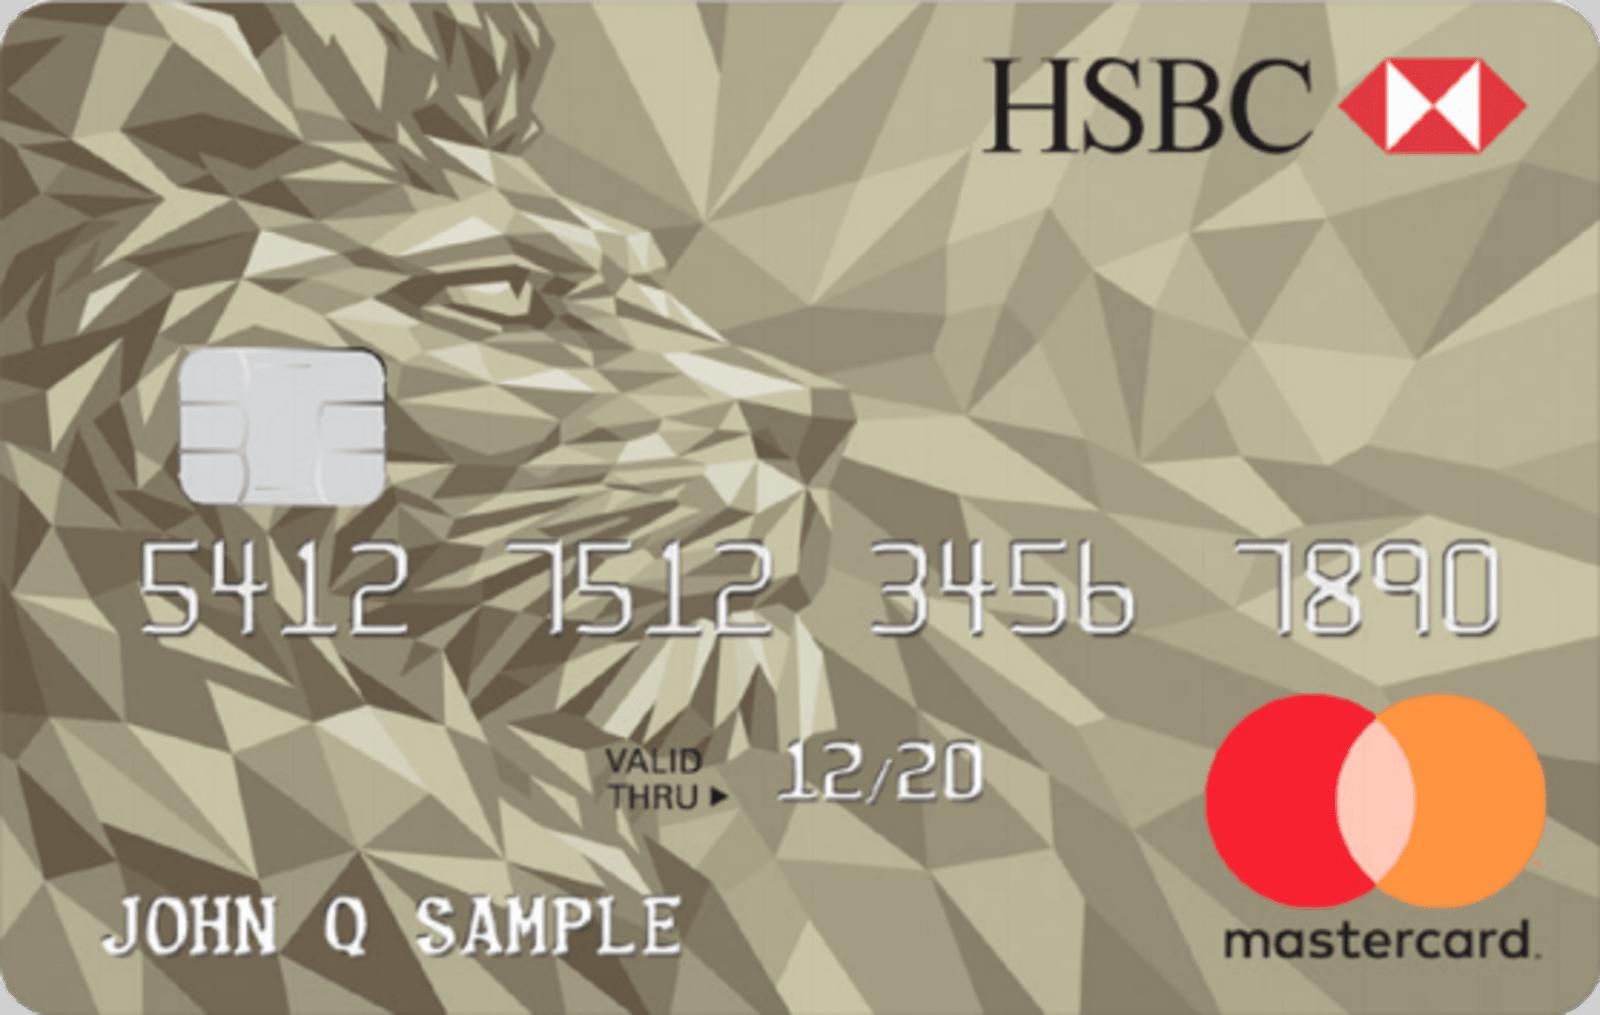 hsbc premier world mastercard review